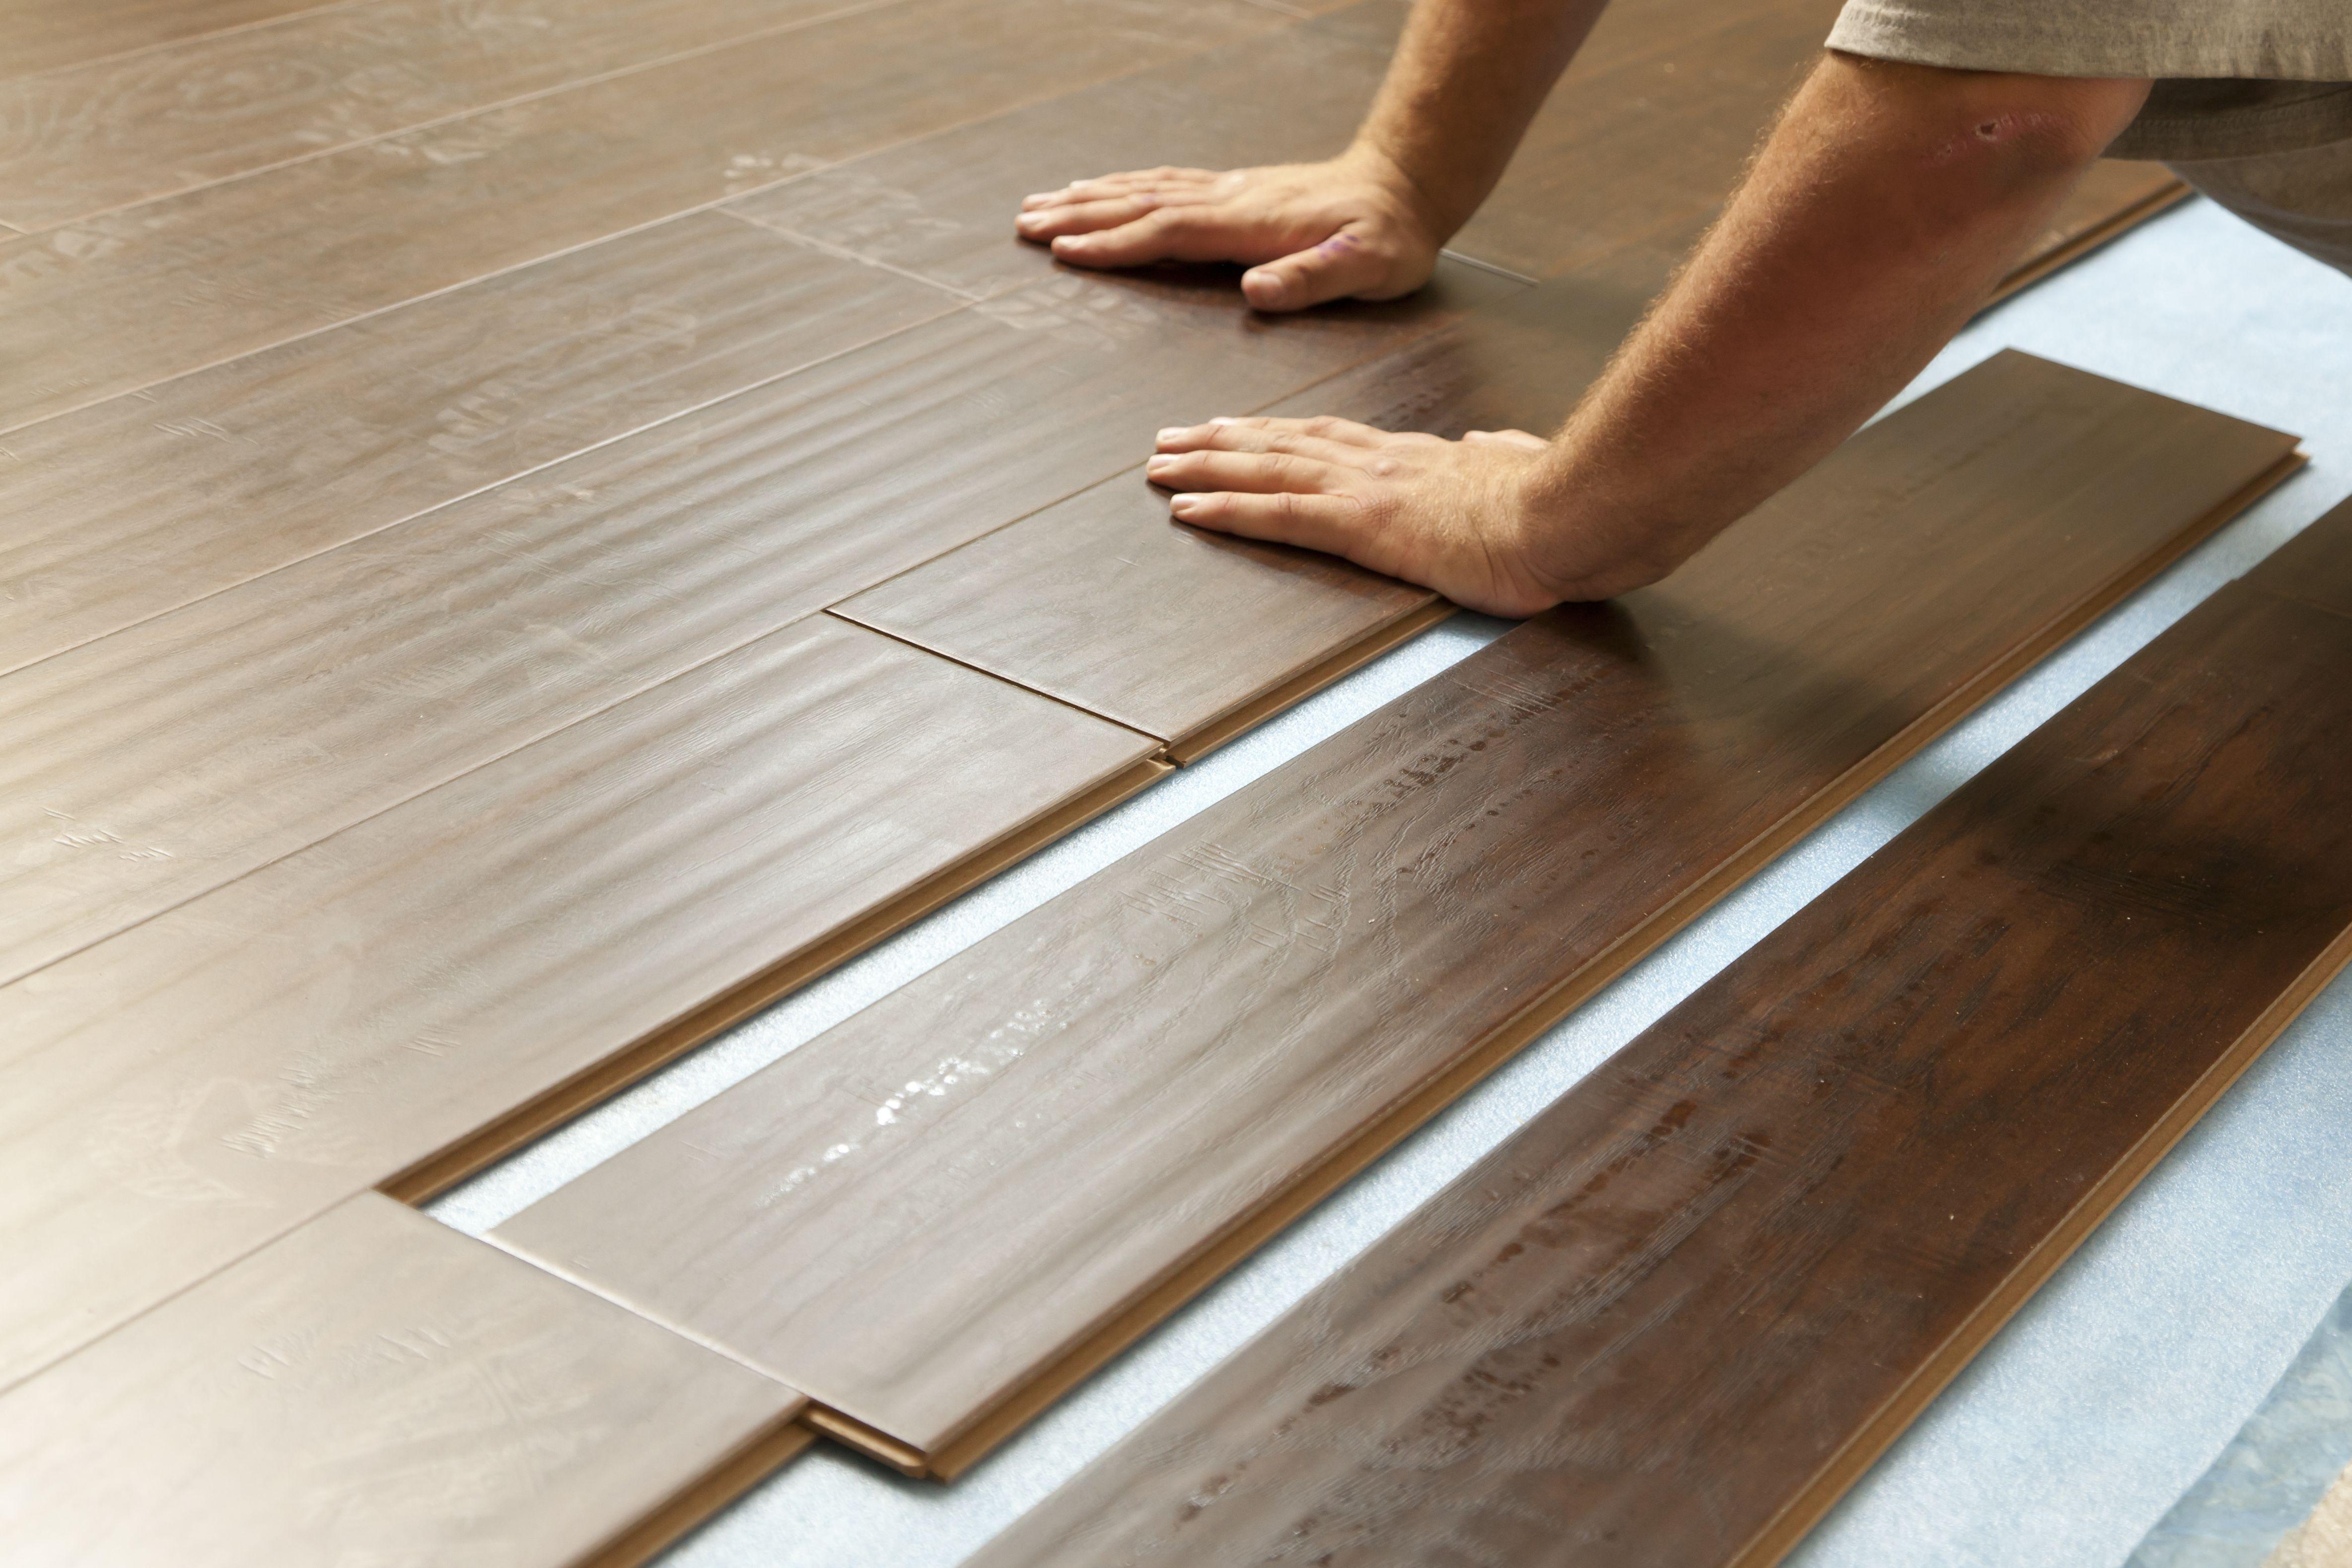 Flooring Installation Southport Nc Wood Laminate Flooring Flooring Laminate Hardwood Flooring